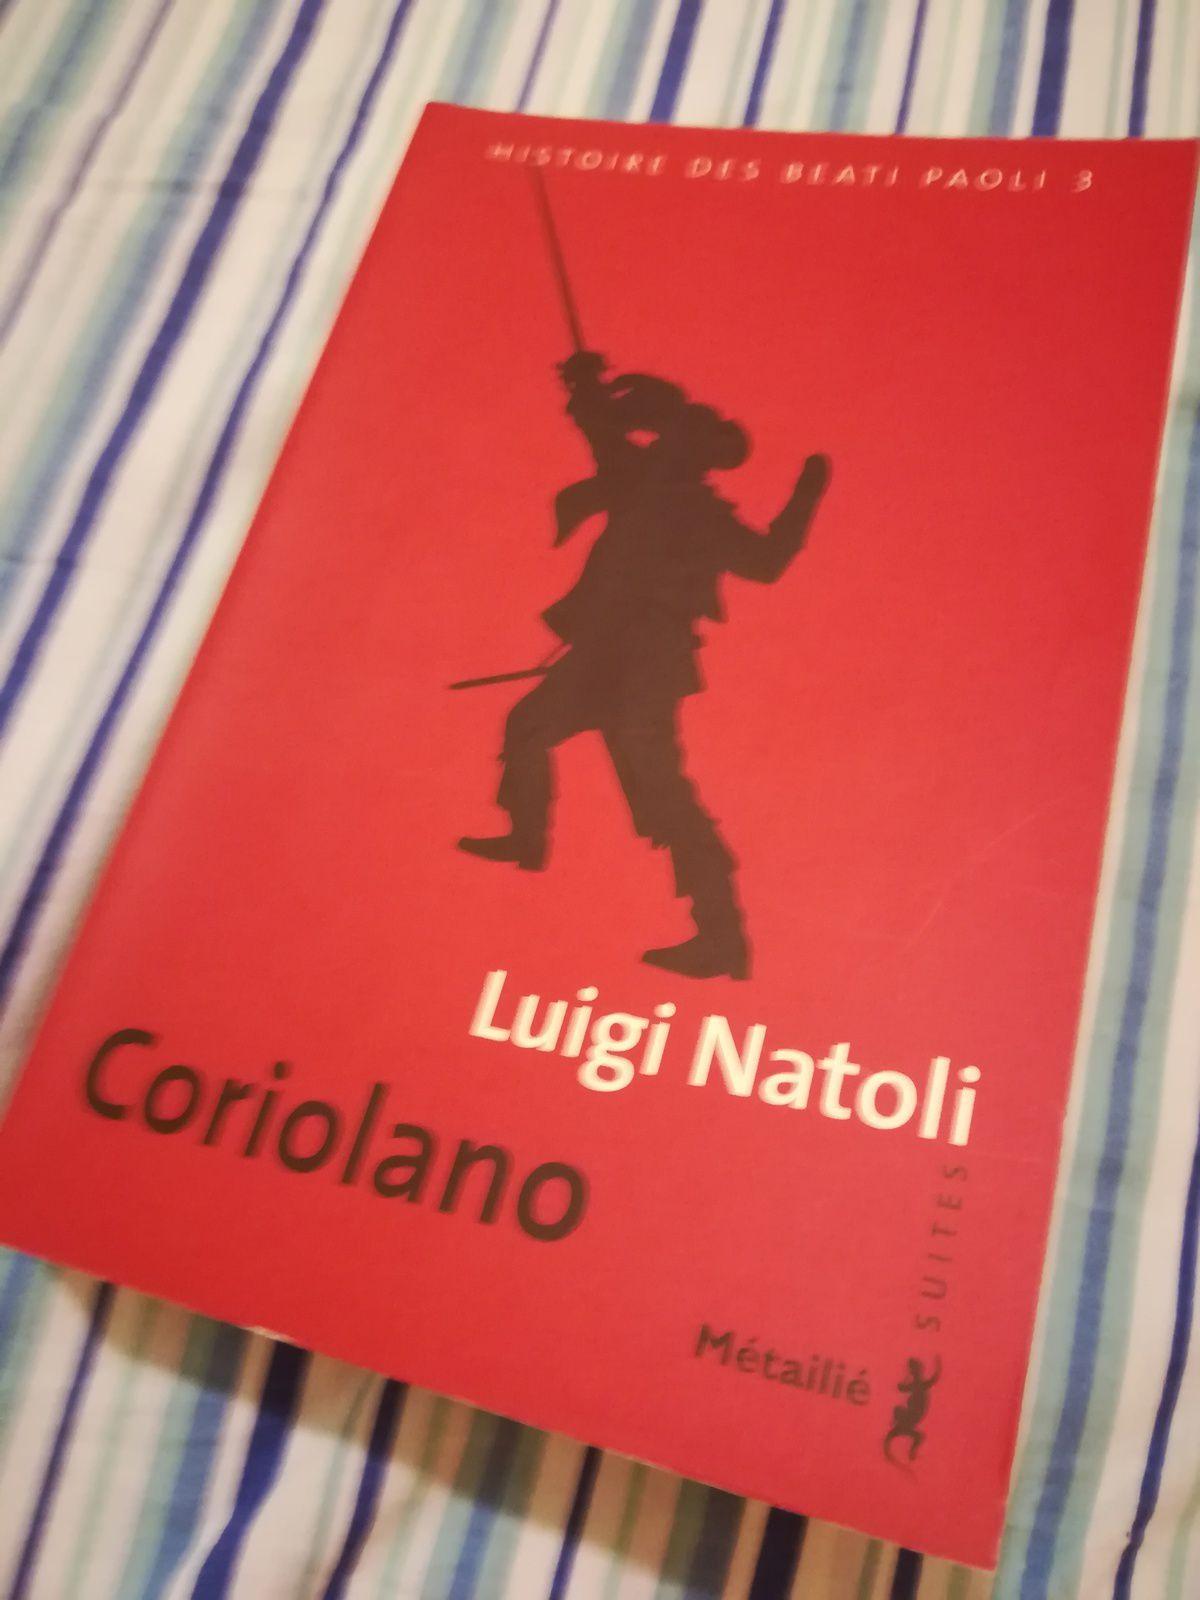 Jeuditalie : Coriolano (Histoire des Beati Paoli 3)